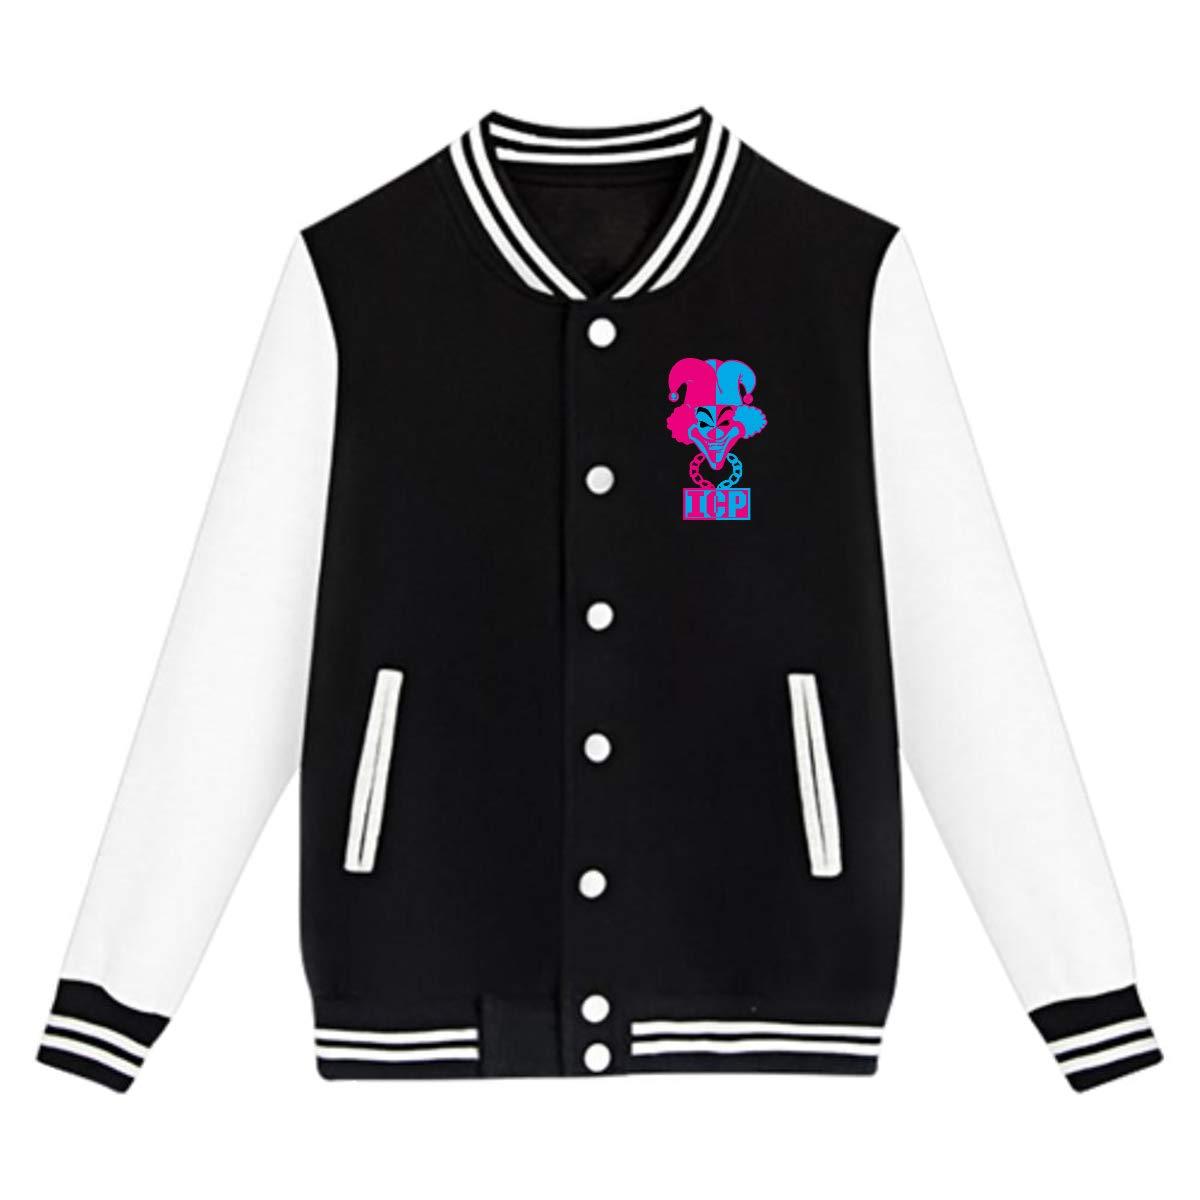 LIALUER Hatchetman ICP Boys Kids Baseball Uniform Jacket Coat Sweater